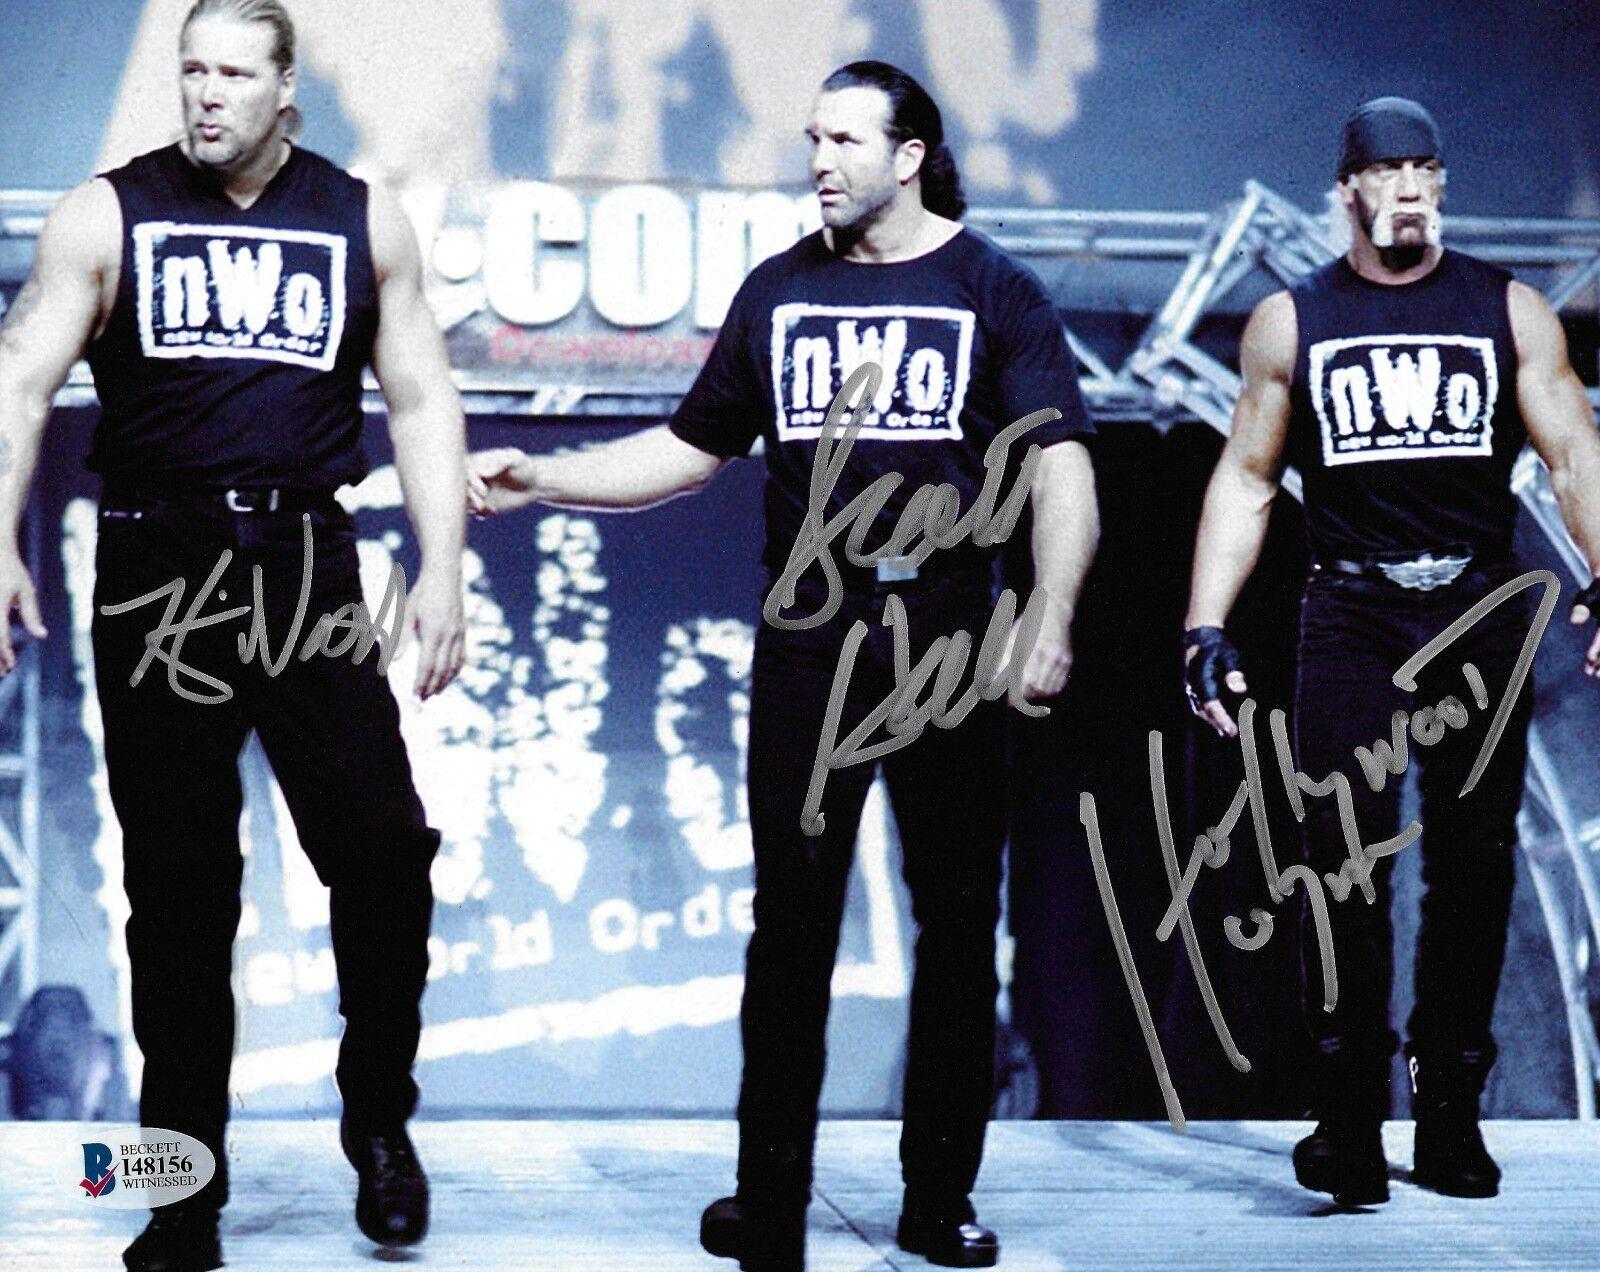 Hulk Hogan Scott Hall Kevin Nash signed 8x10 Photo Bas Beckett cert. de autenticidad Wwe Nwo Wcw 1